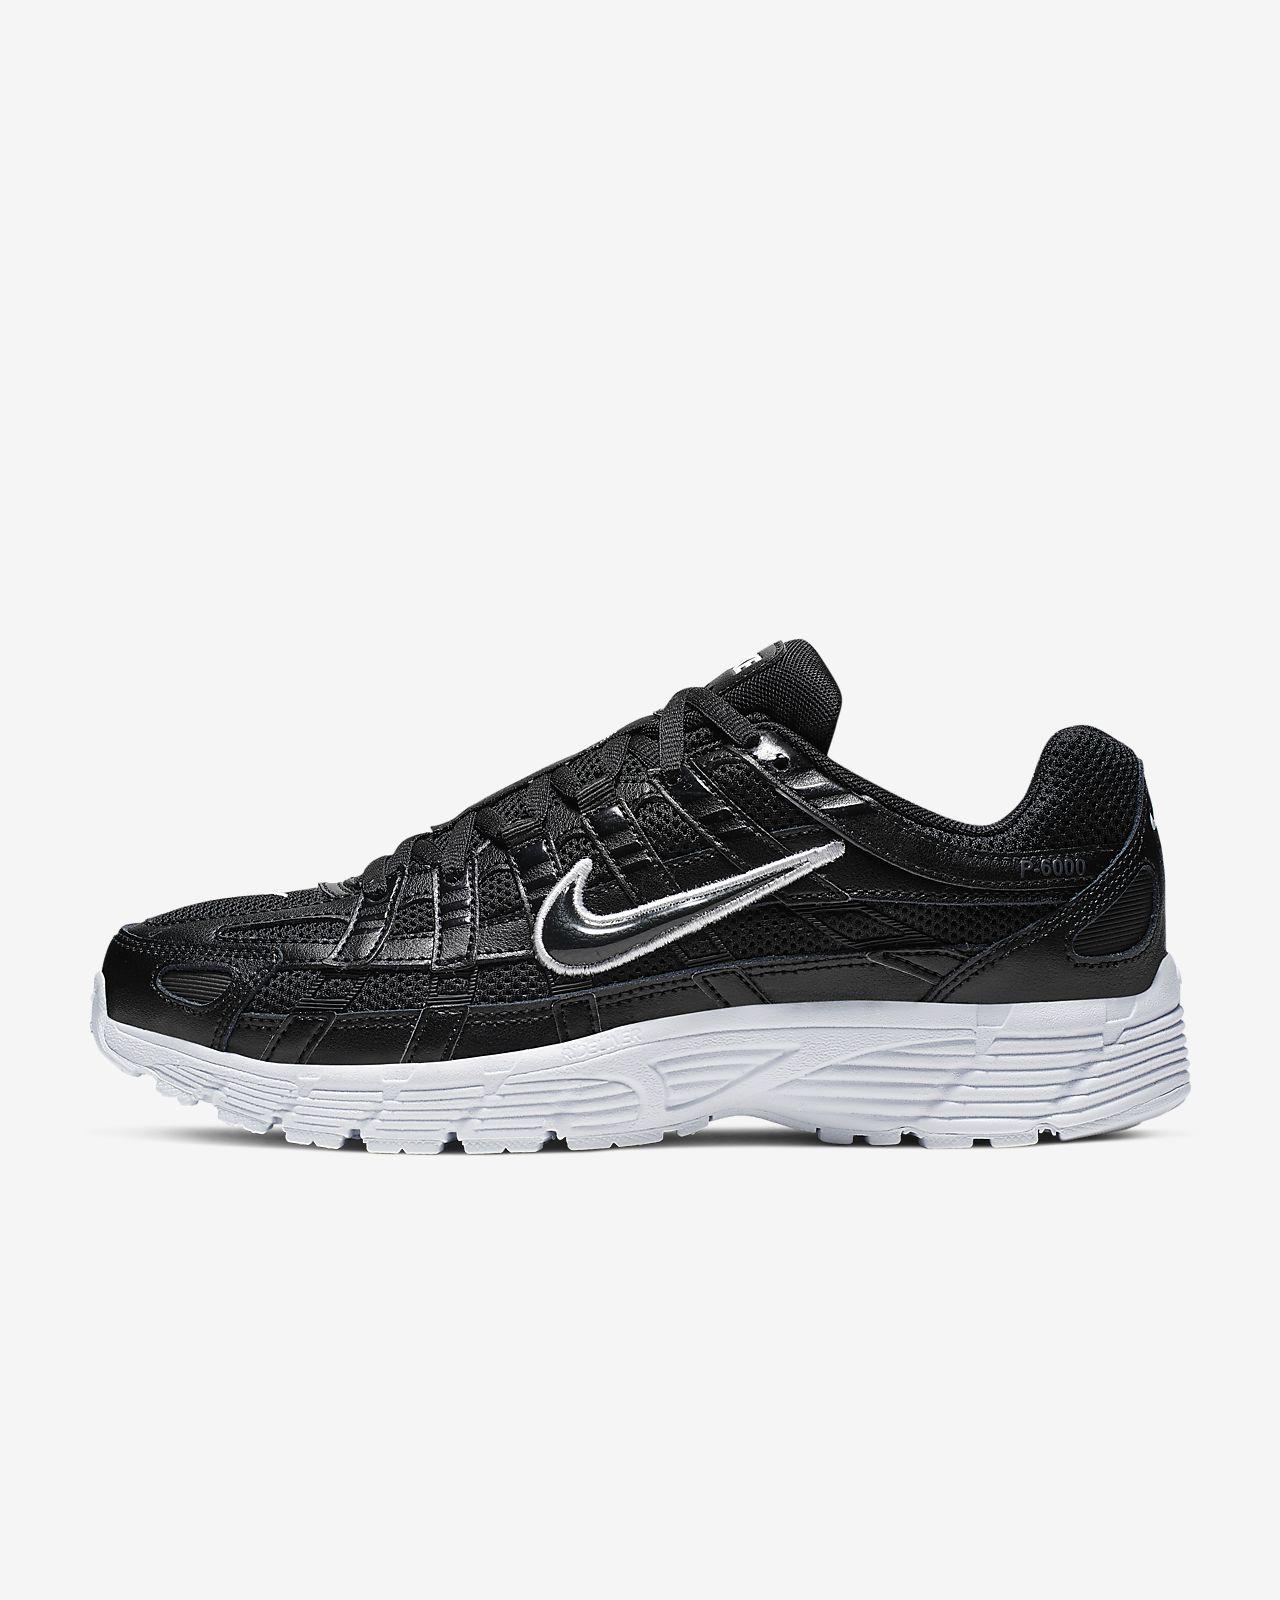 Nike Yoga Sko Herre Udsalg,Køb Billige Nike Sko På Tilbud